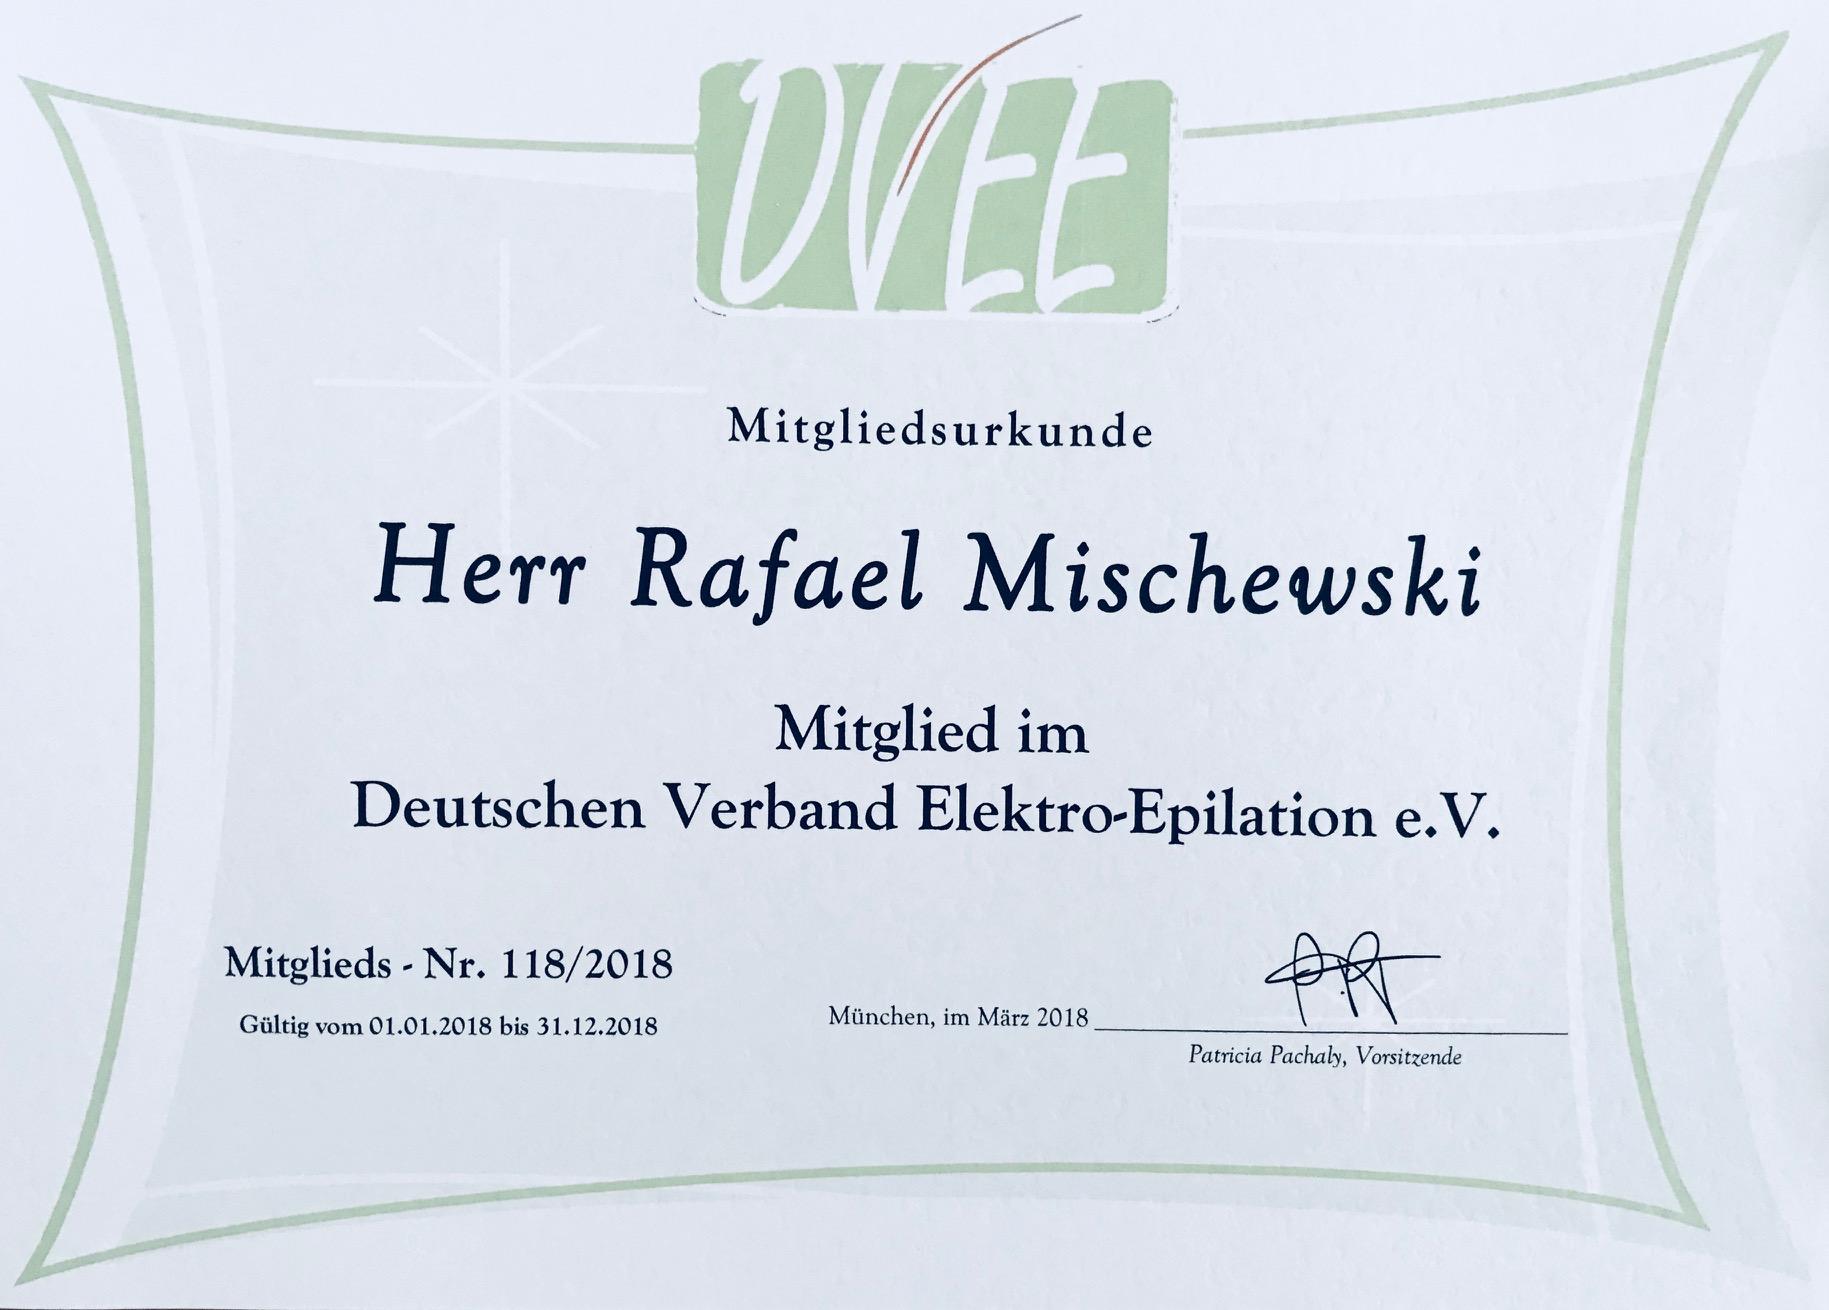 Mitglied im Deutschen Verband Elektro-Epilation e.V. - RPM Medical ...